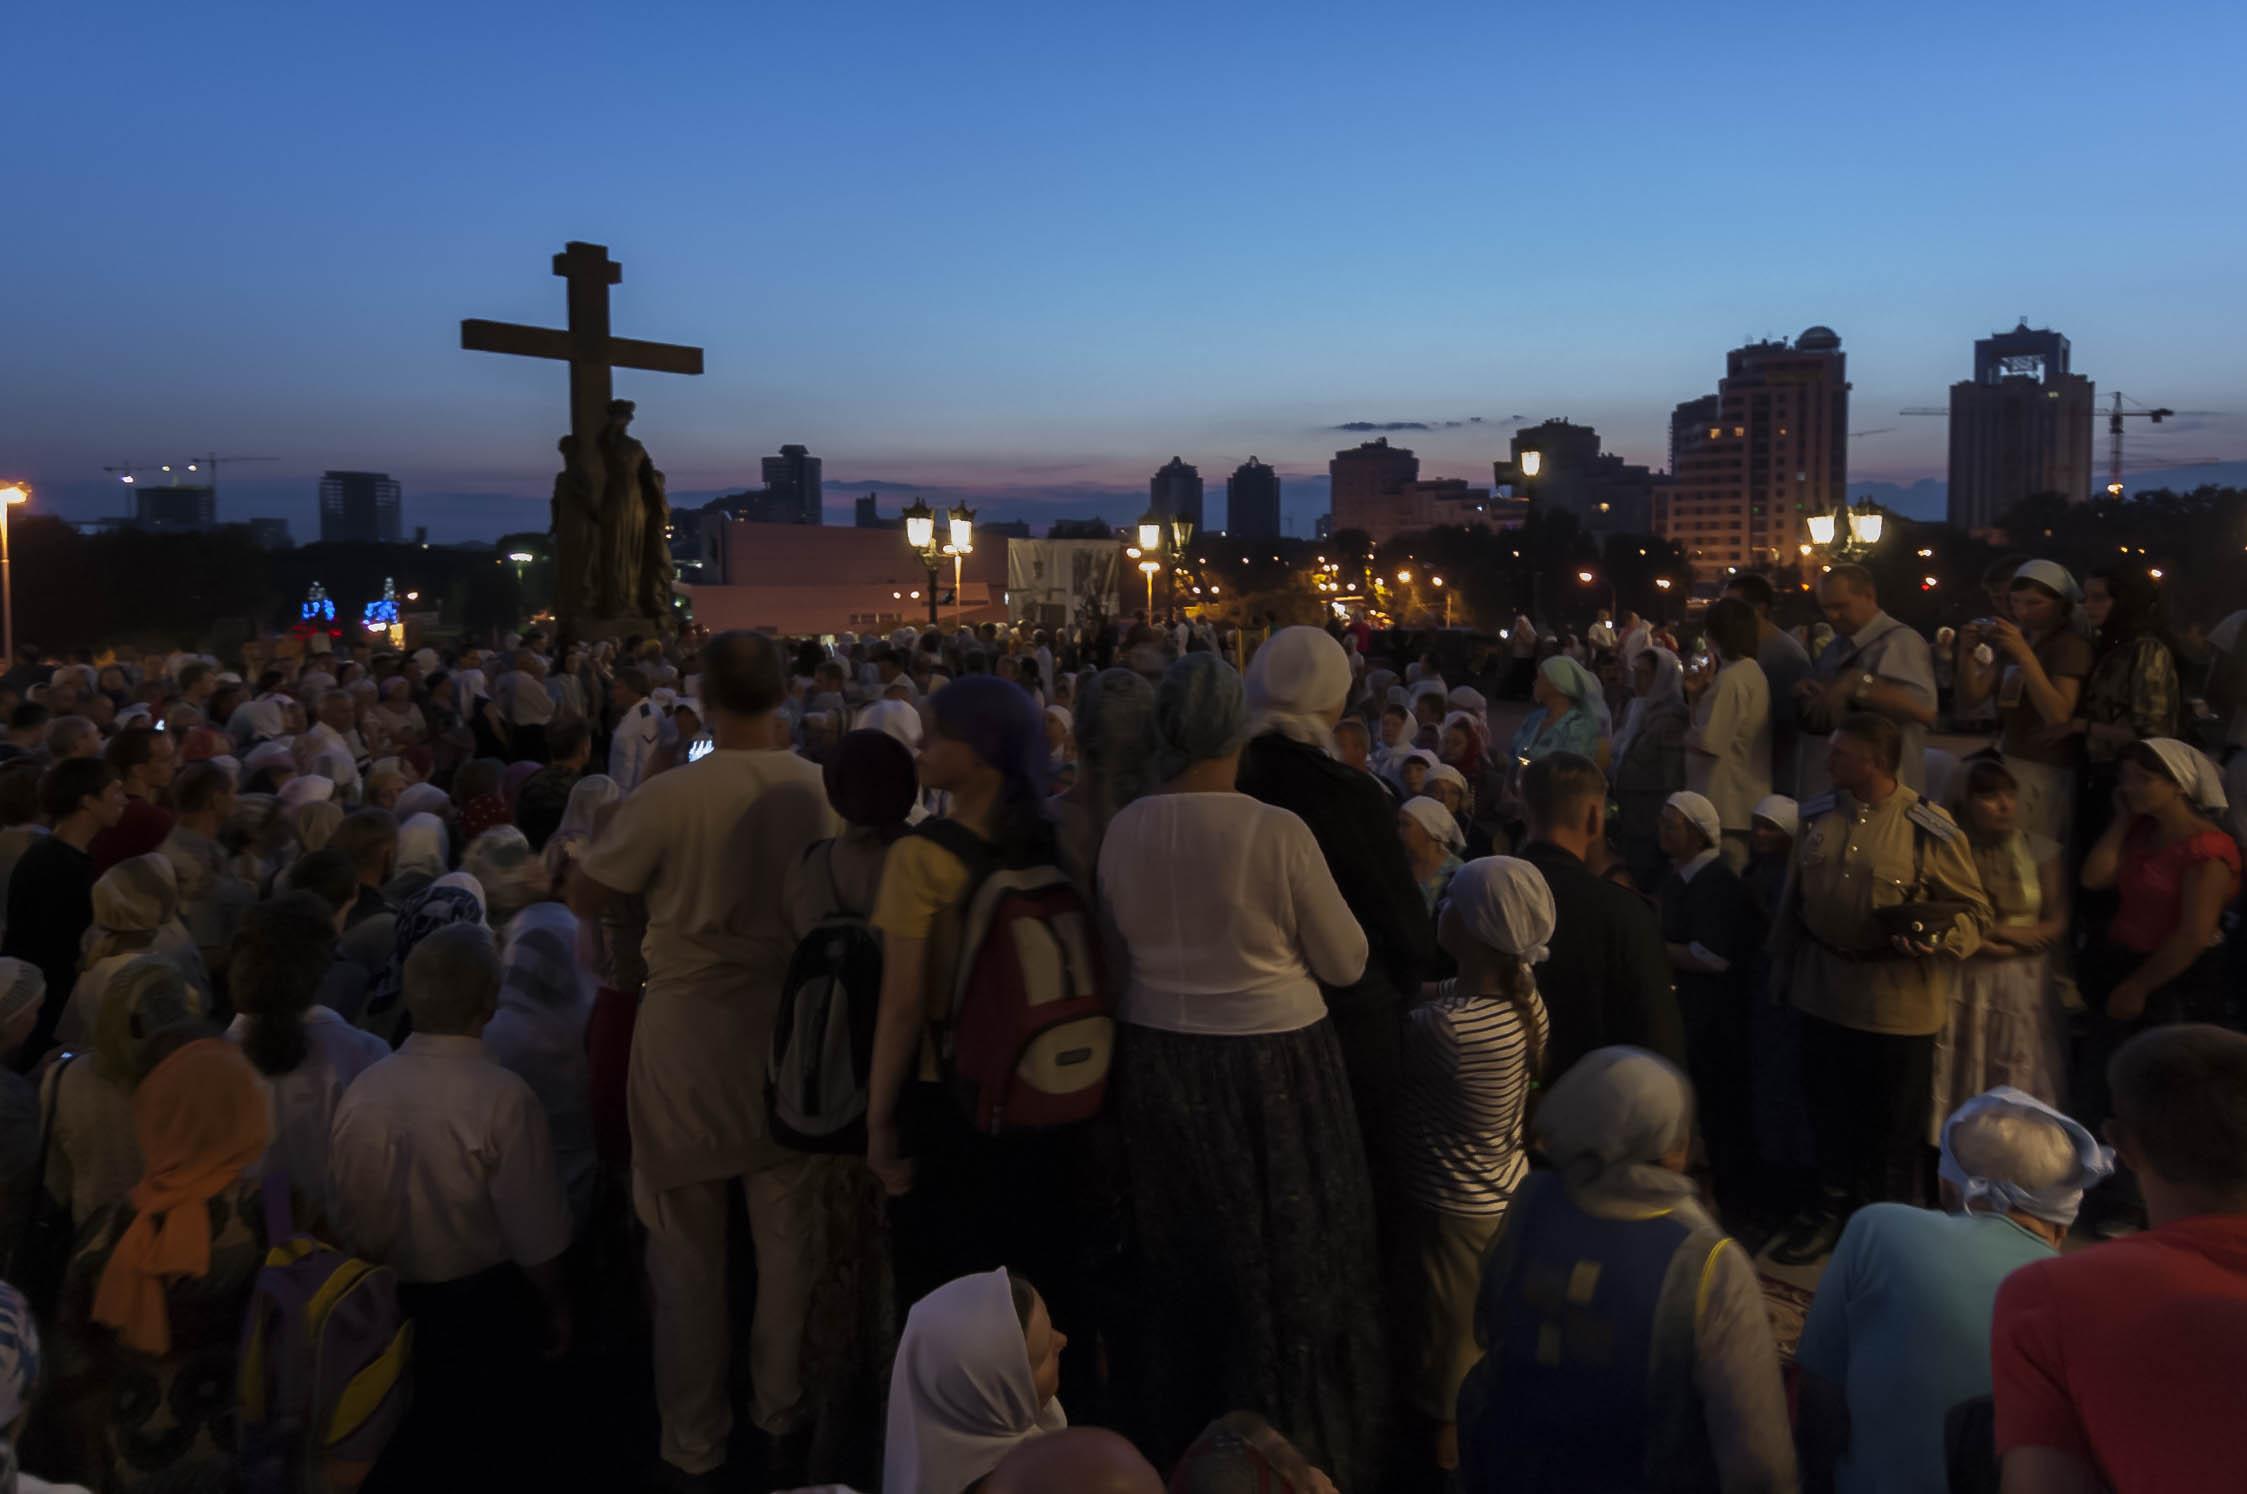 Pilgrims outside the Church on the Blood, Ekaterinburg, July 2008